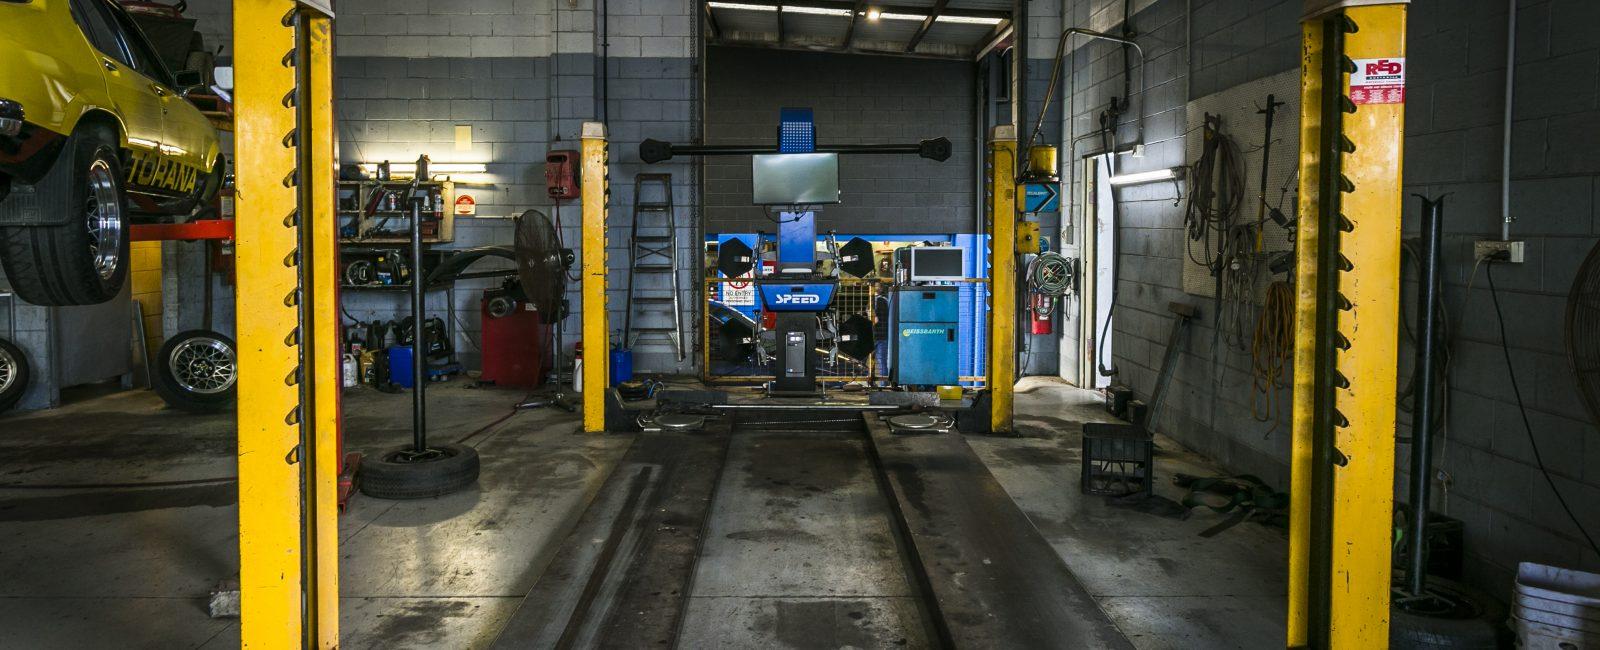 O'Mara's Key Staff & Mechanics Rockhampton